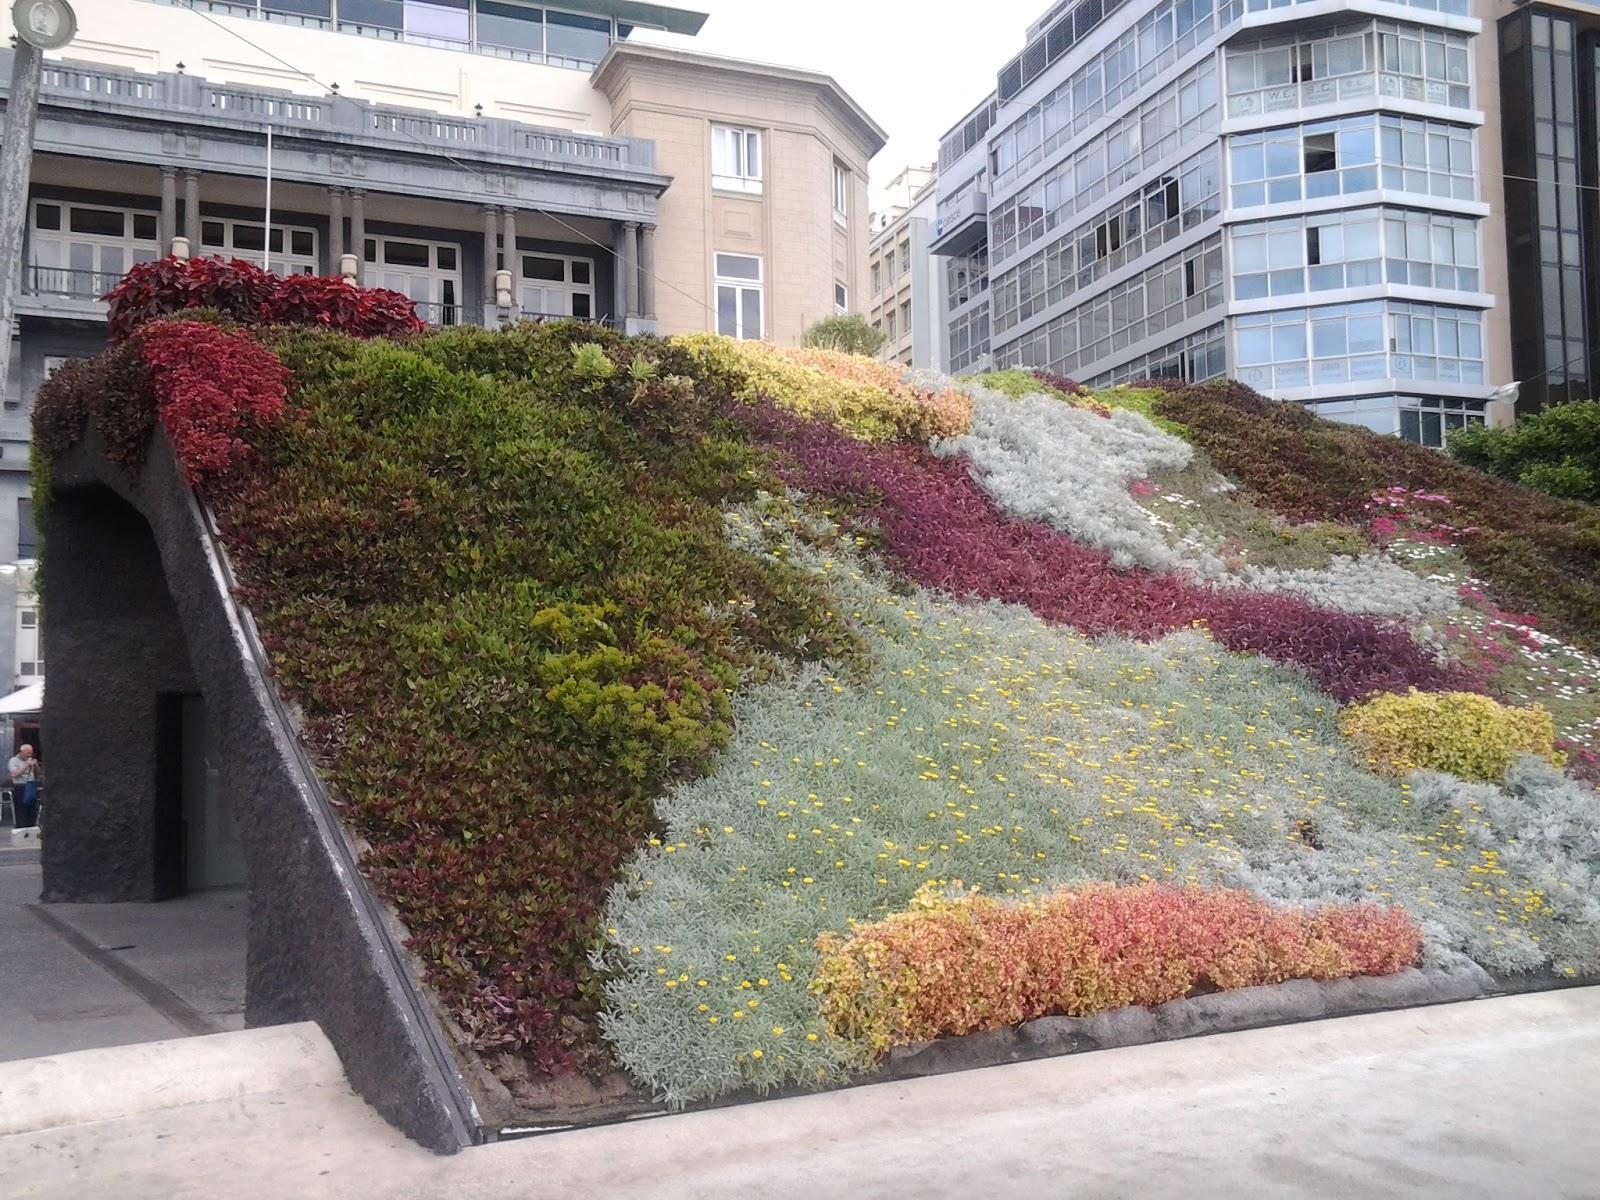 Jardines verticales creciendoentreflores - Estructura jardin vertical ...